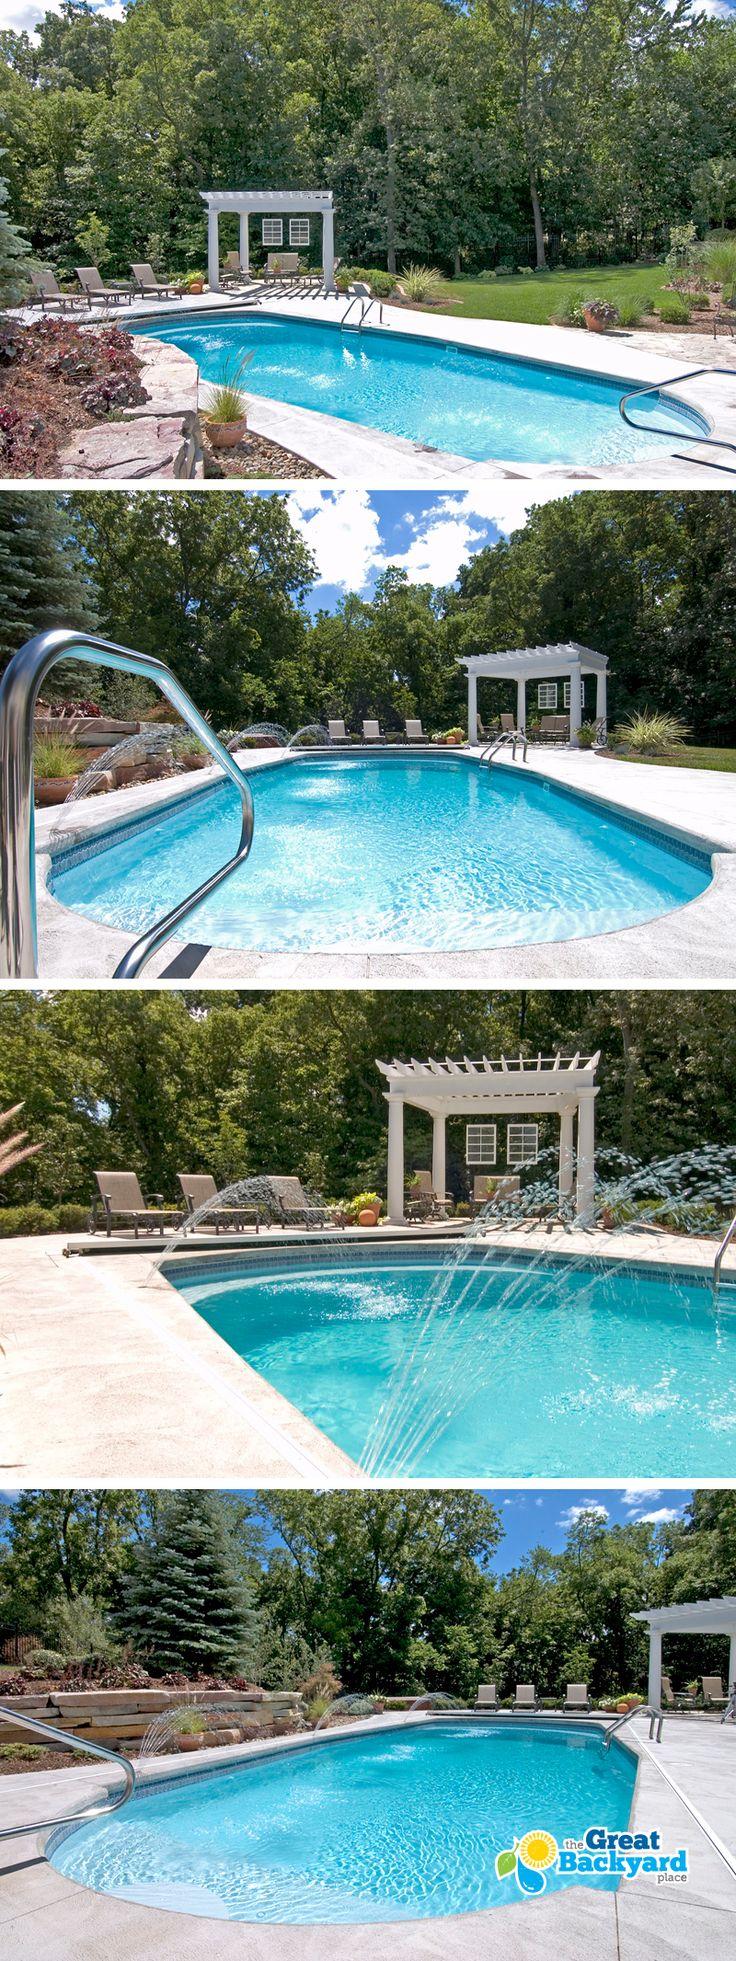 Chattanooga Fiberglass Pools